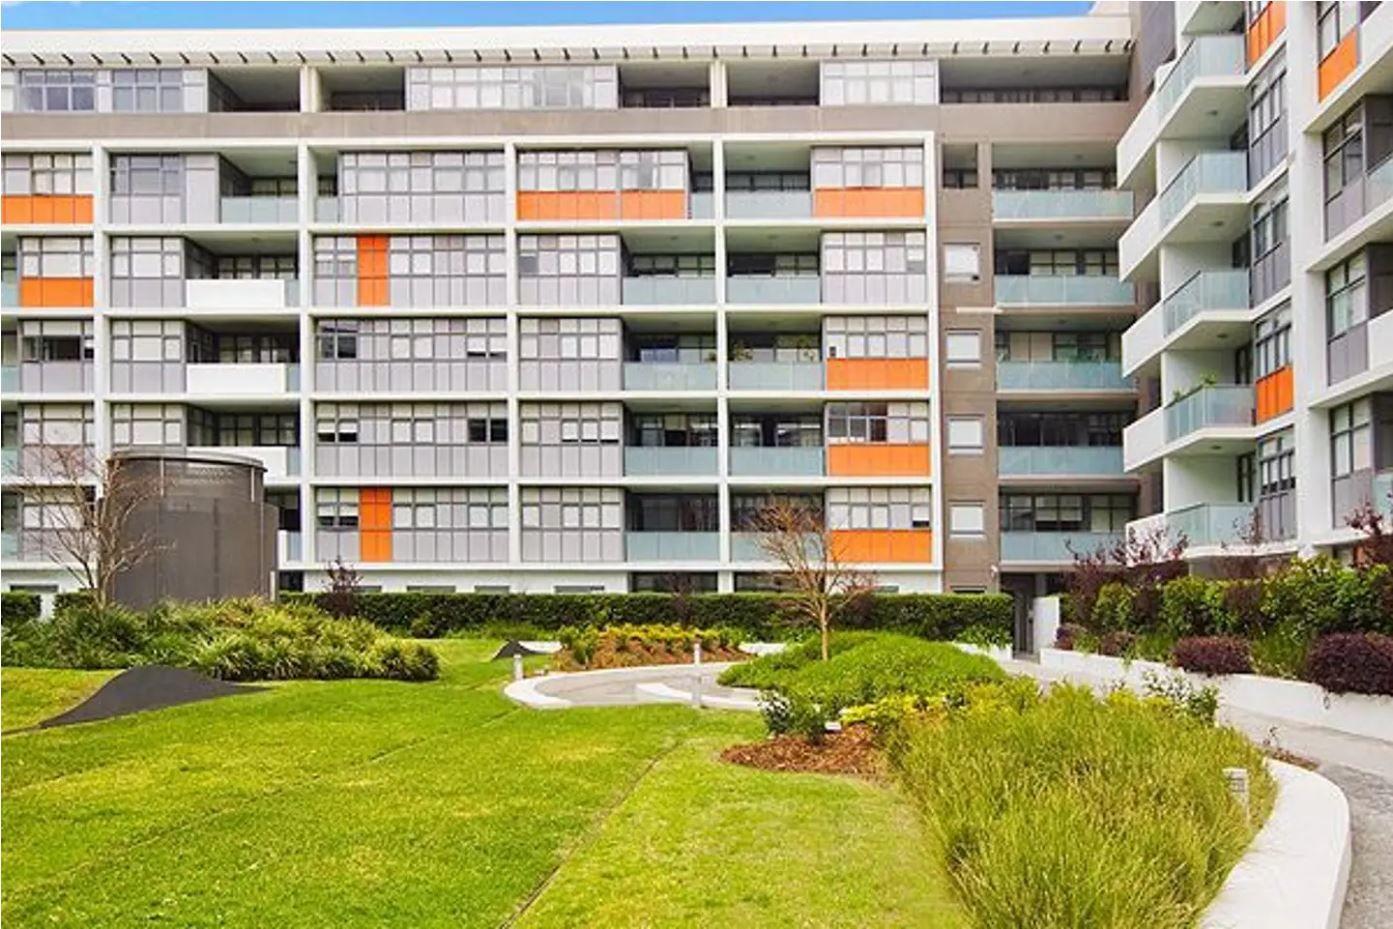 715/140 Maroubra Rd, Maroubra NSW 2035, Image 1